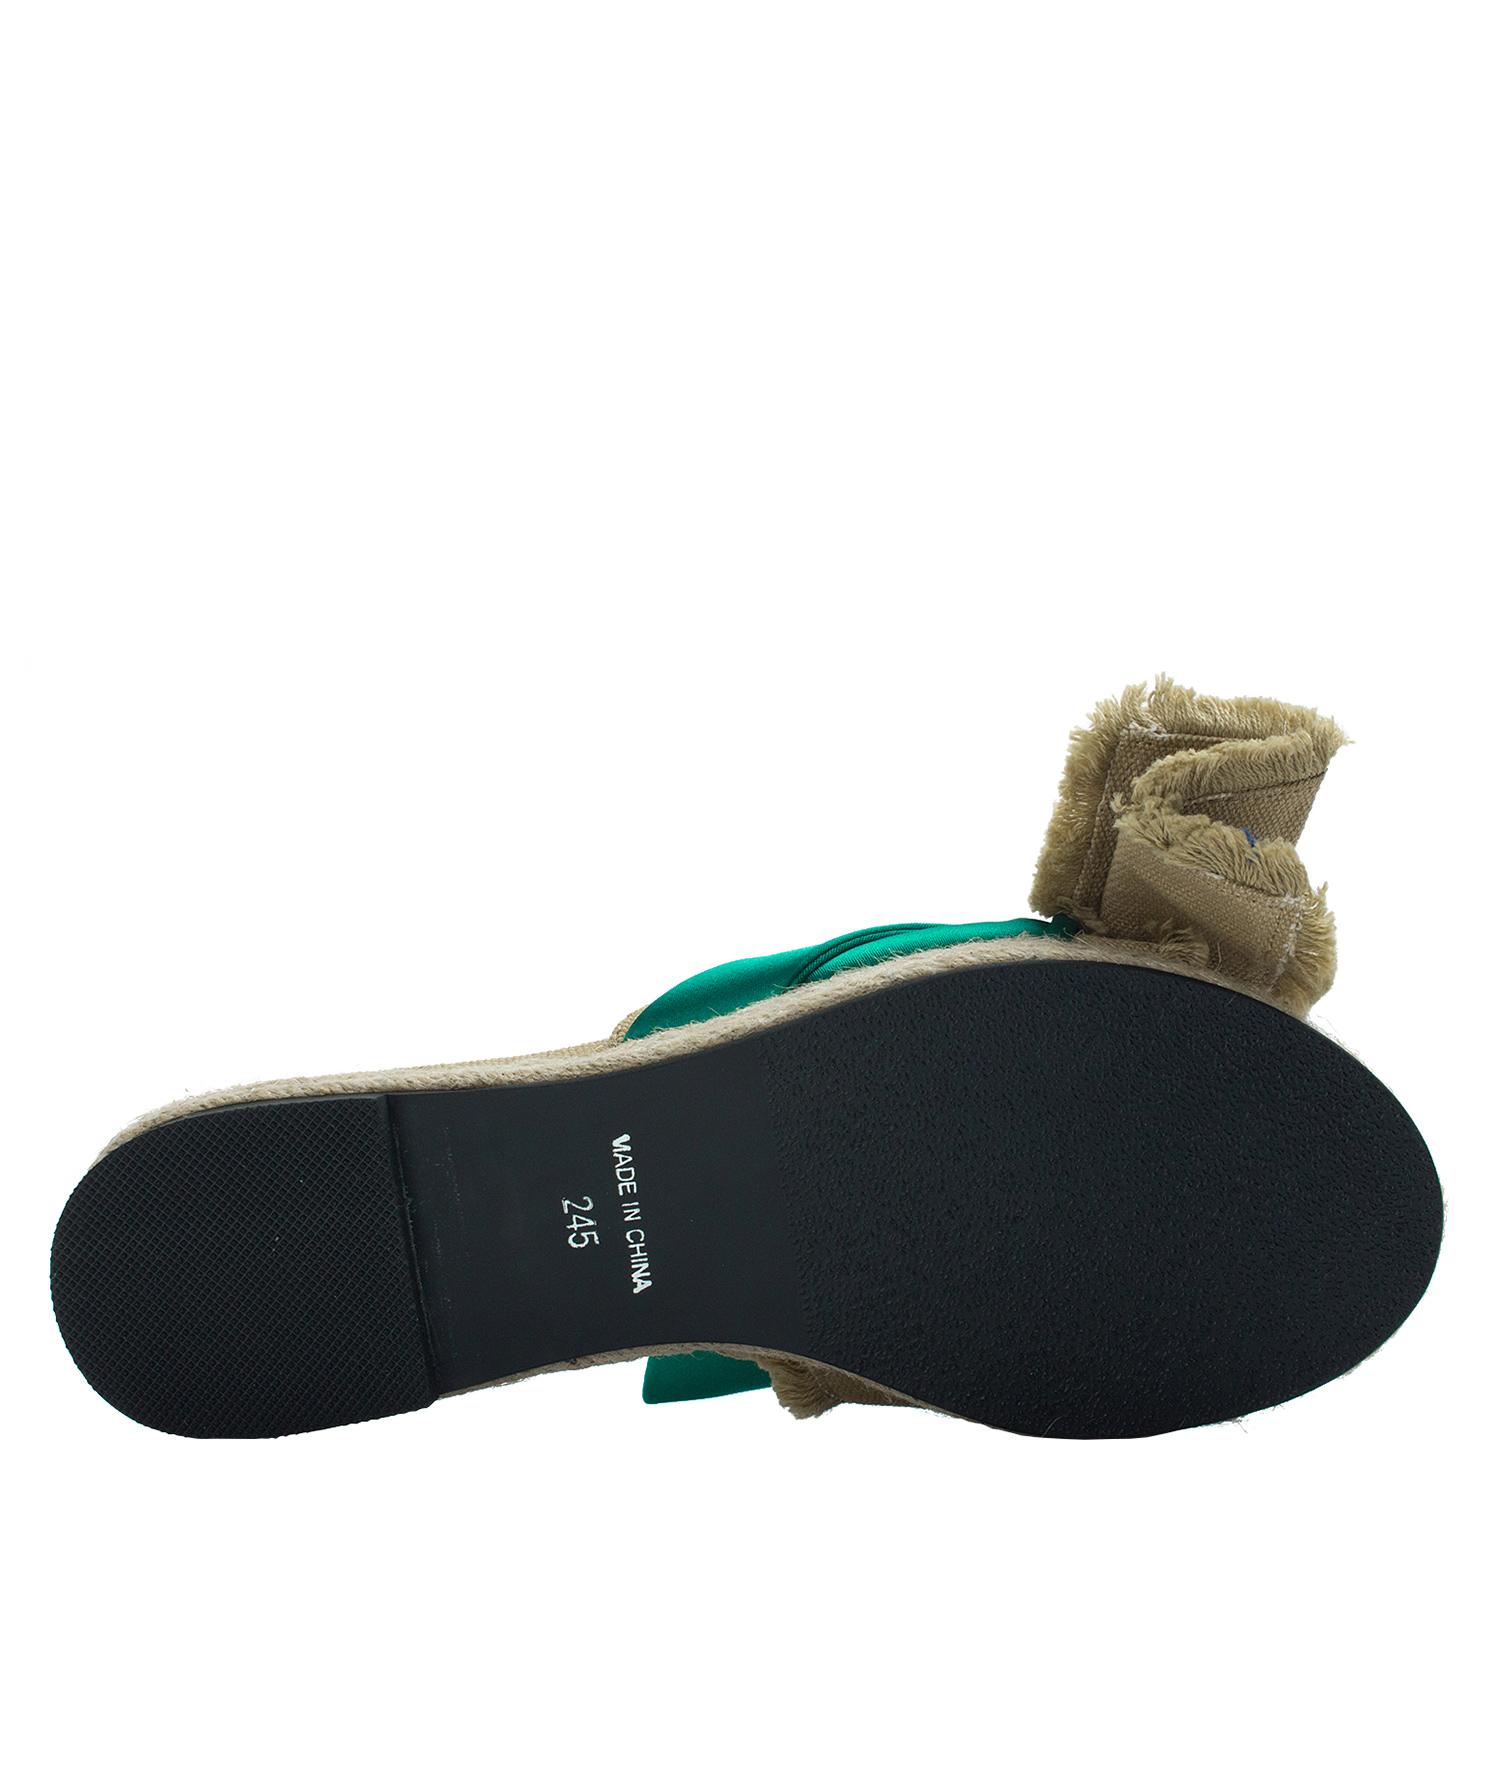 7b38c5cf83f Annakastle Womens Natural Bow Jute Platform Sandals Green + Khaki